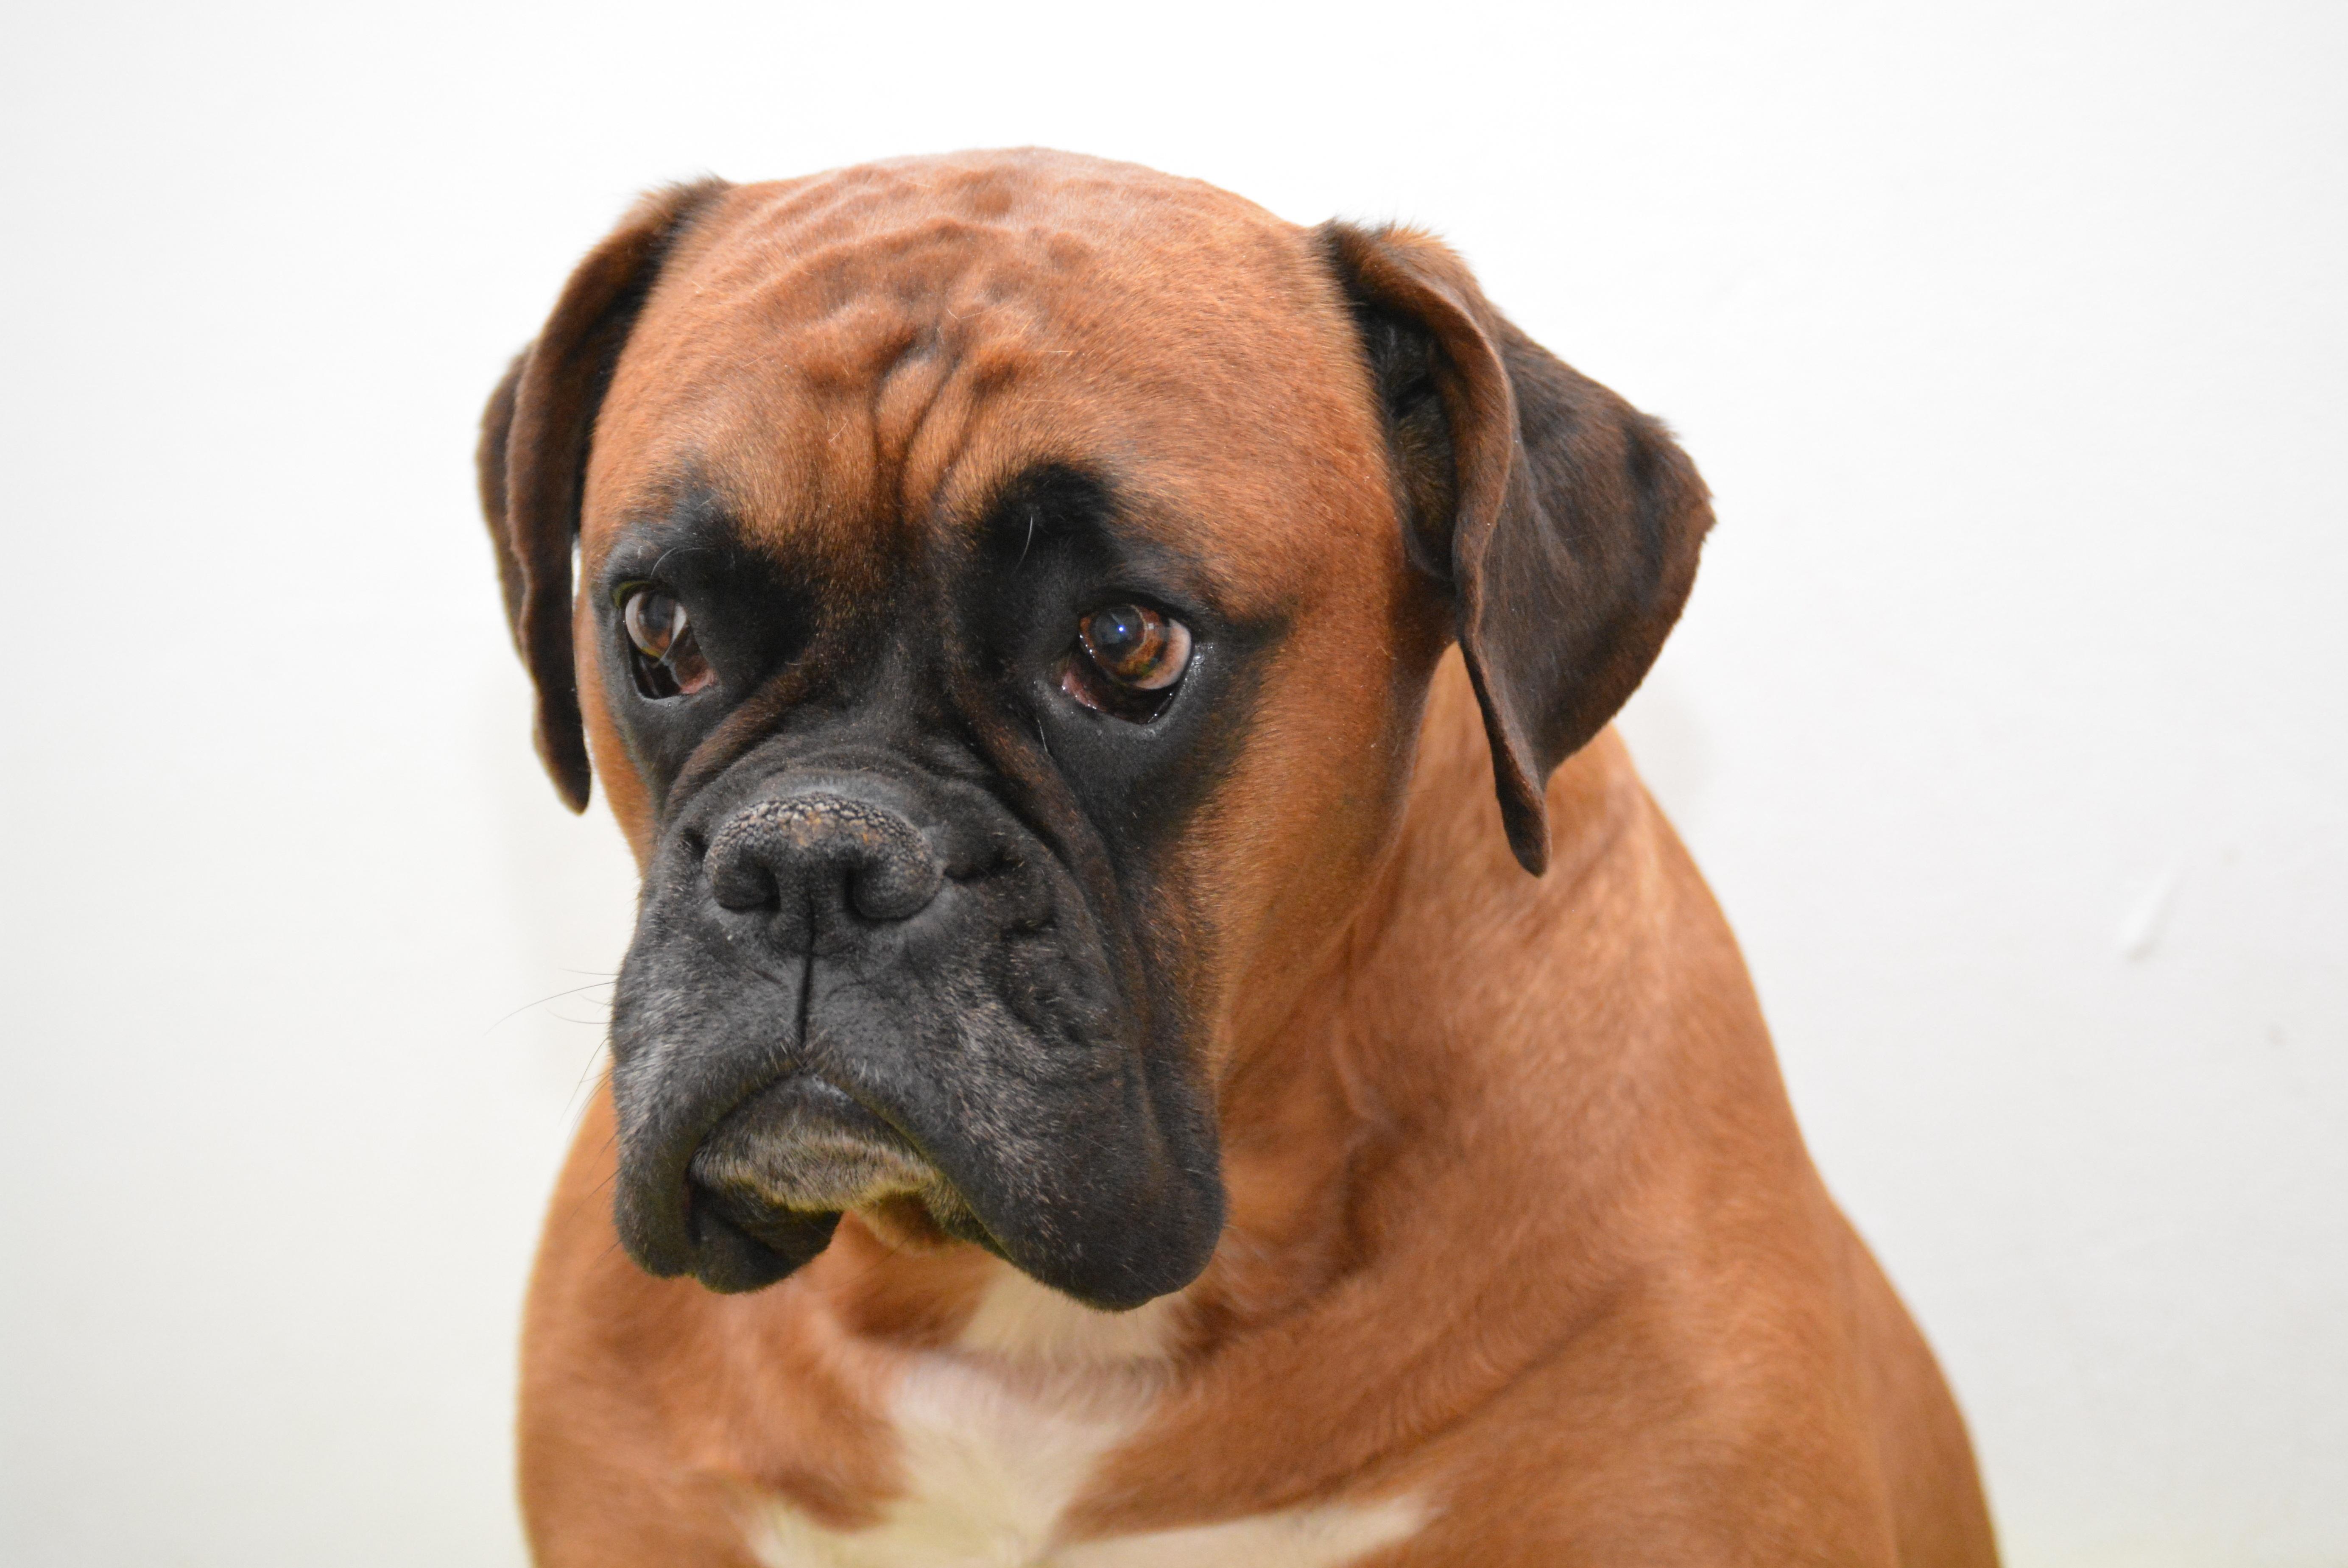 boxer dog portrait 5k retina ultra hd wallpaper background image